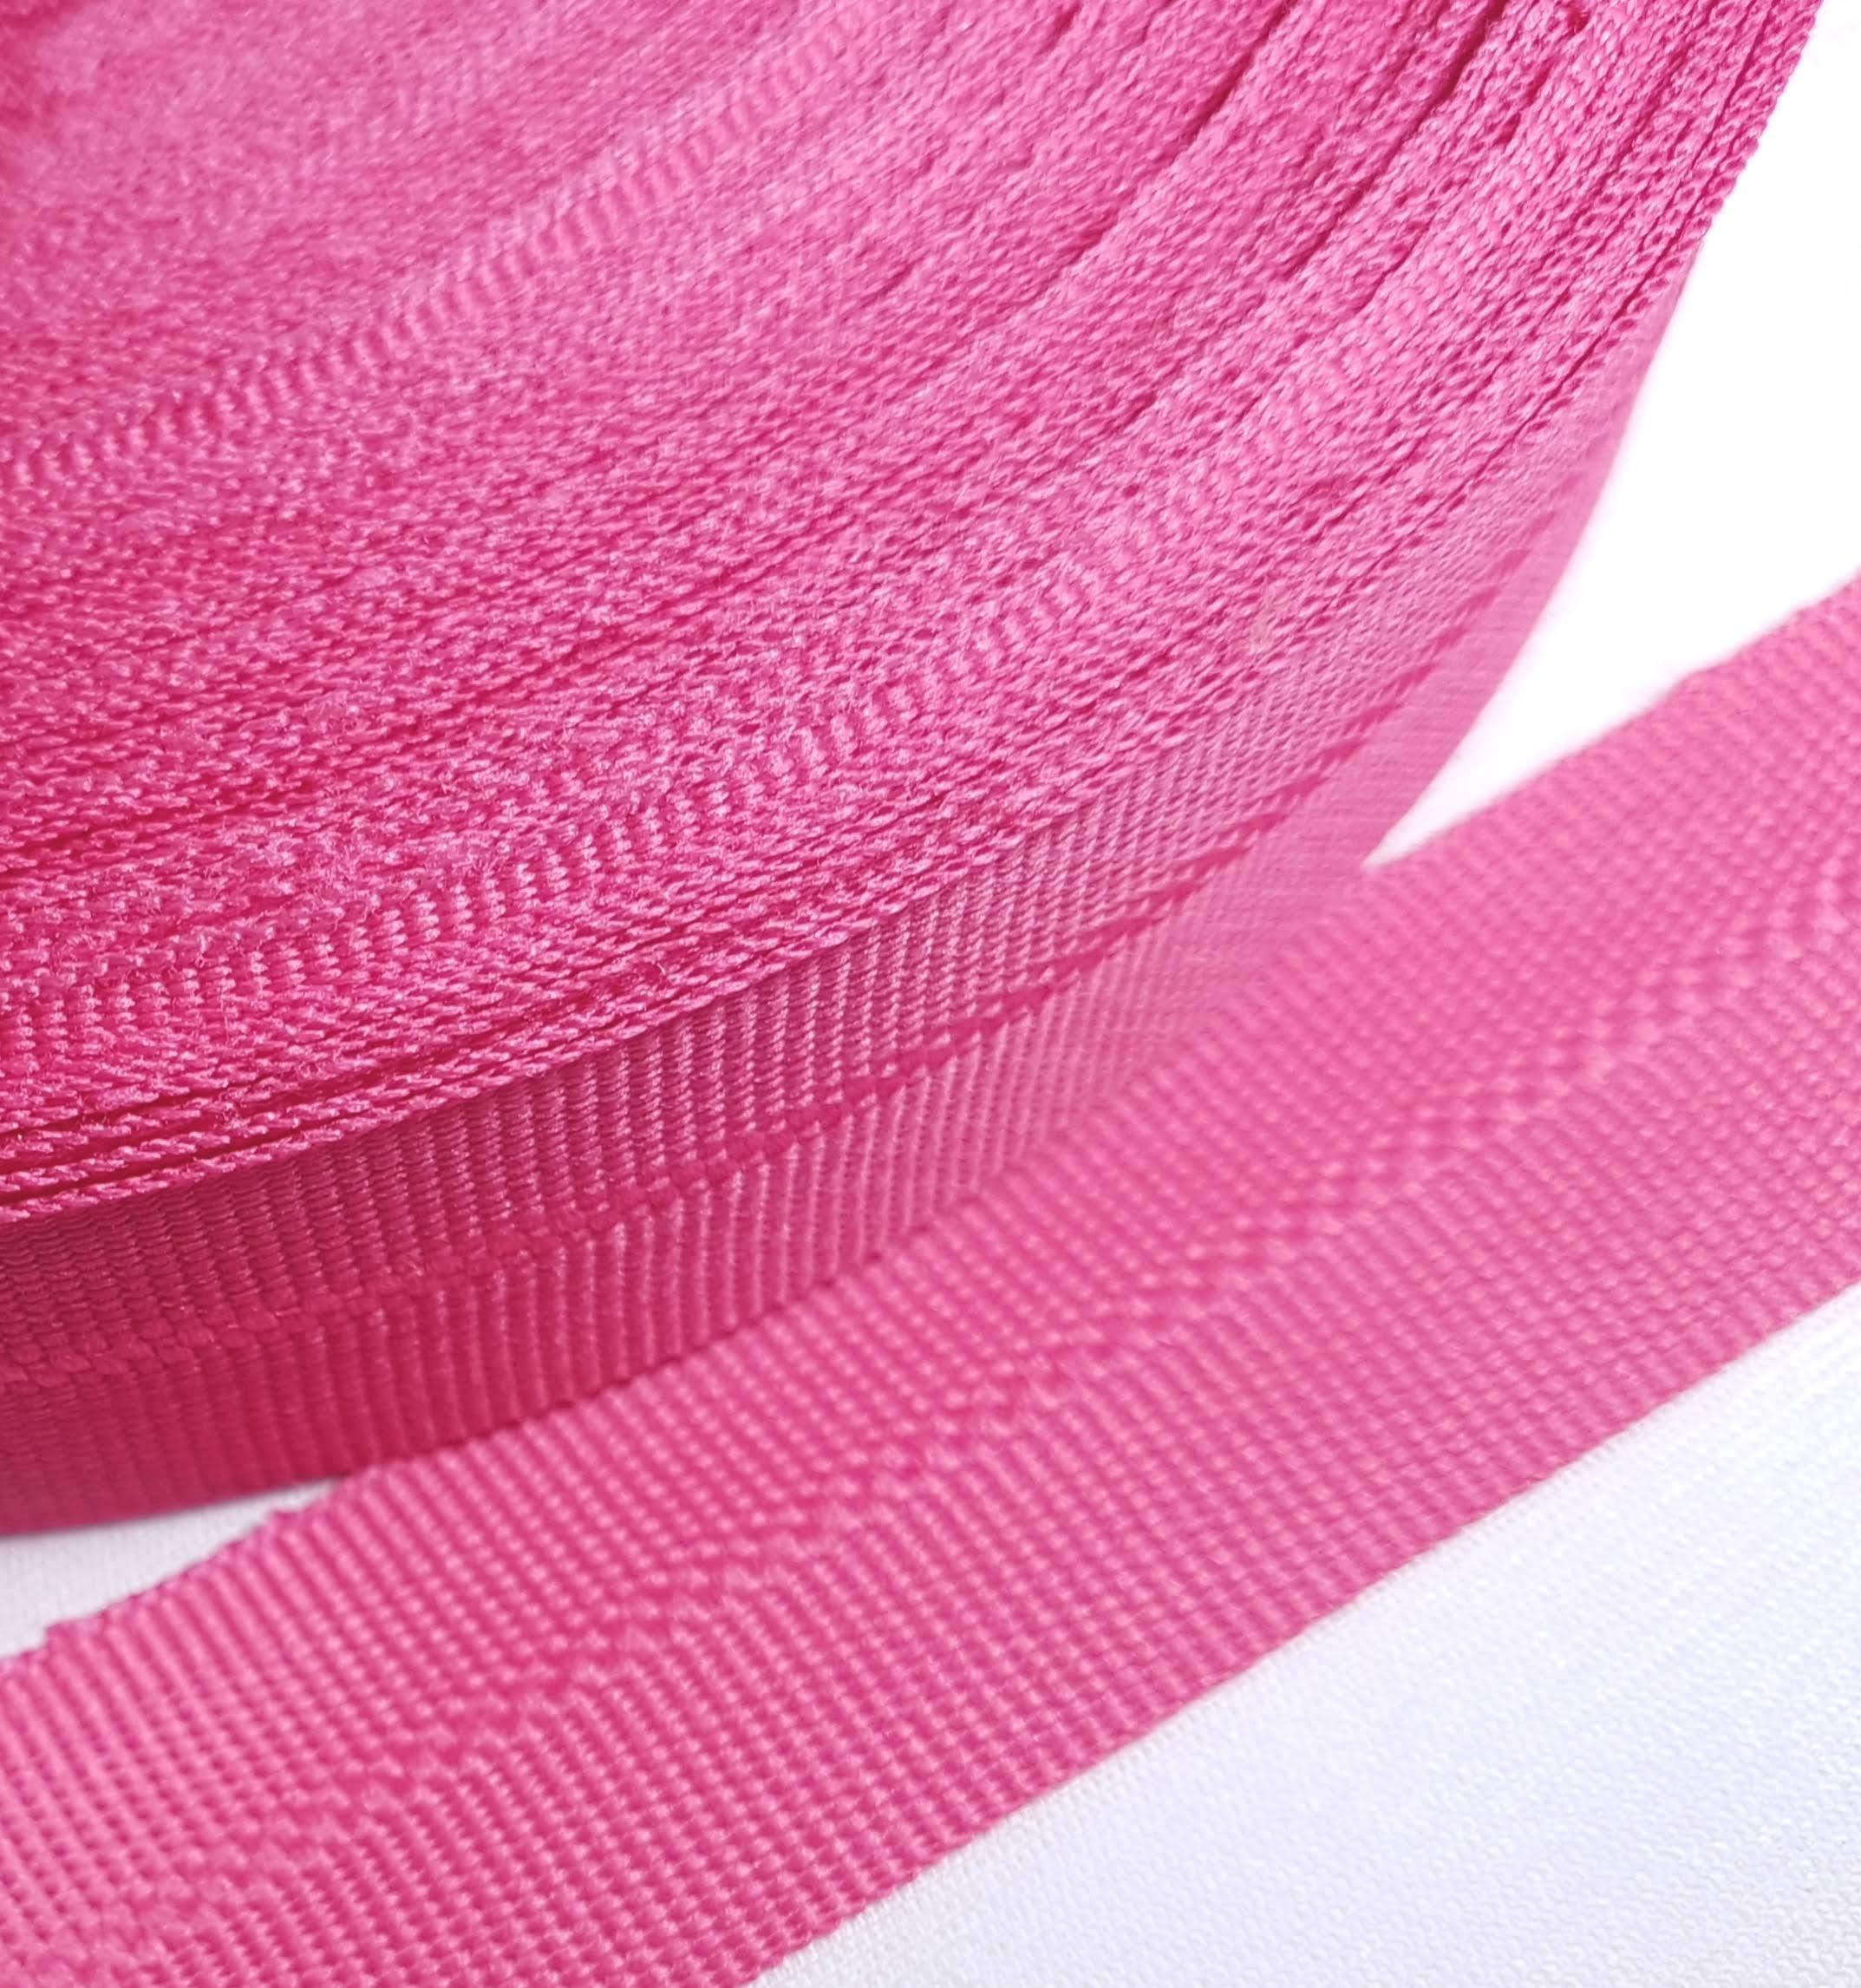 Viés Industrial (gorgurão) Pink c/ 5mt